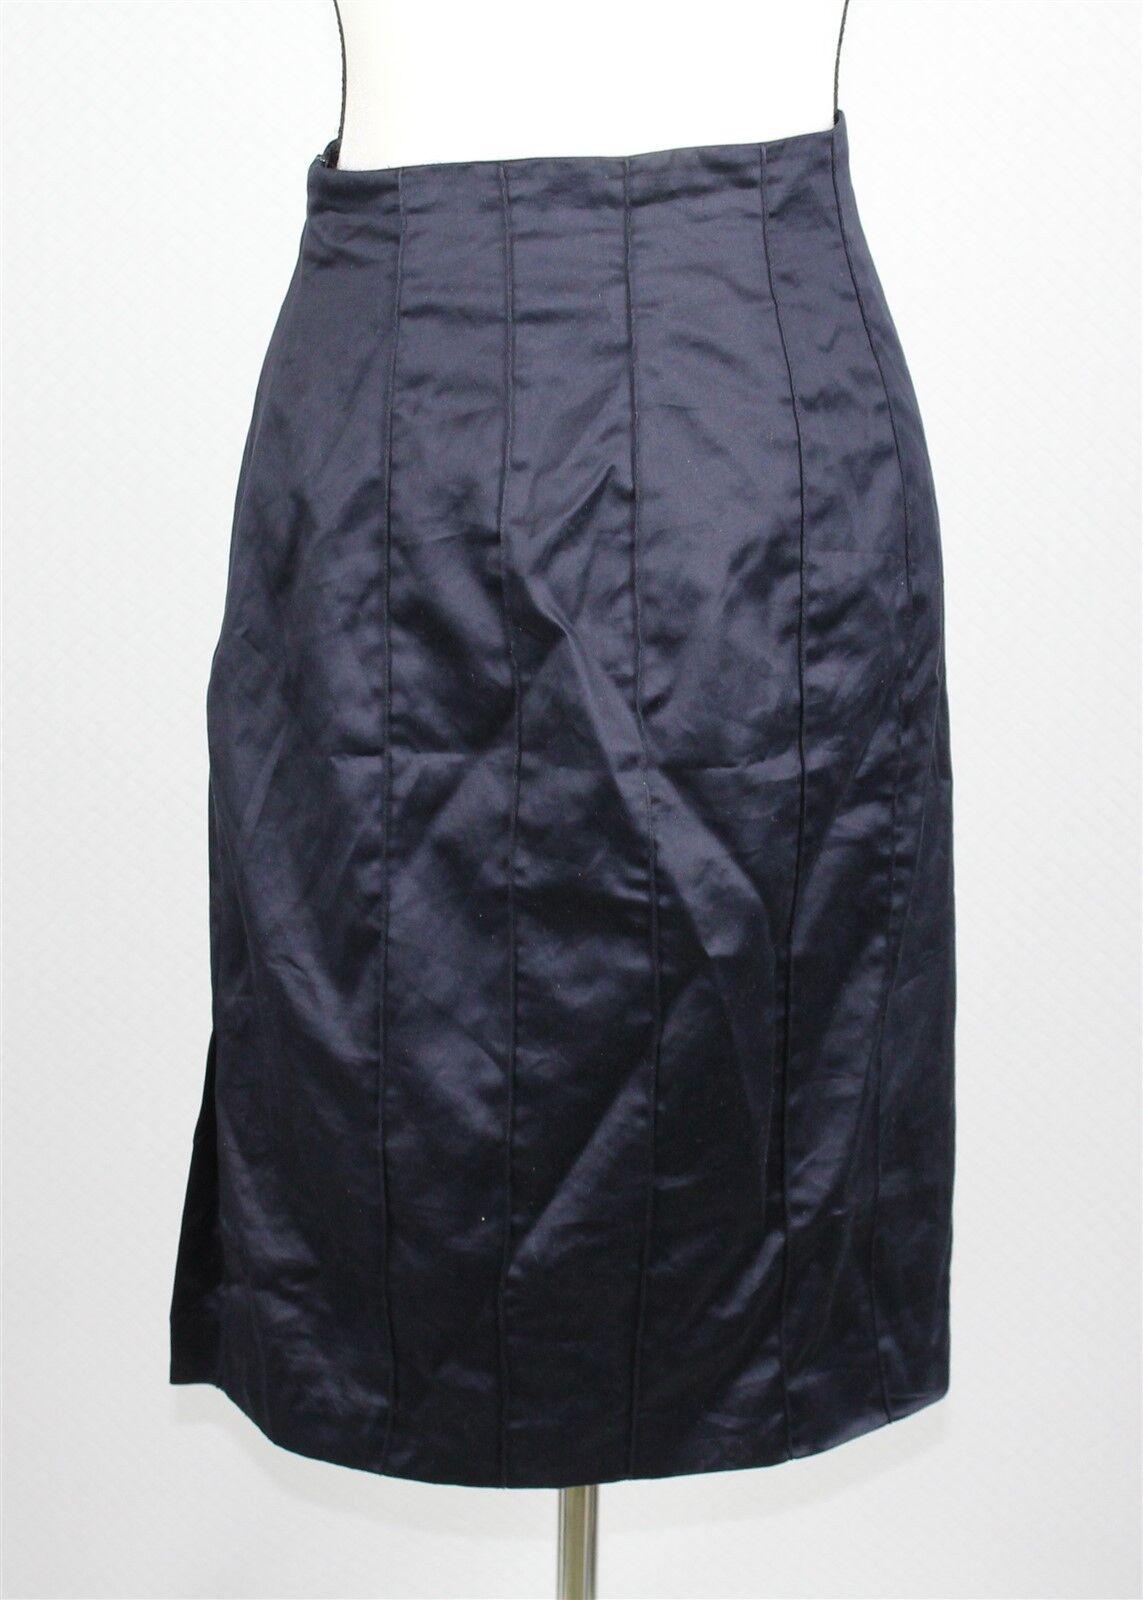 Fendi Women's Skirt 10 Navy bluee 100% Cotton Straight Pencil Knee Length